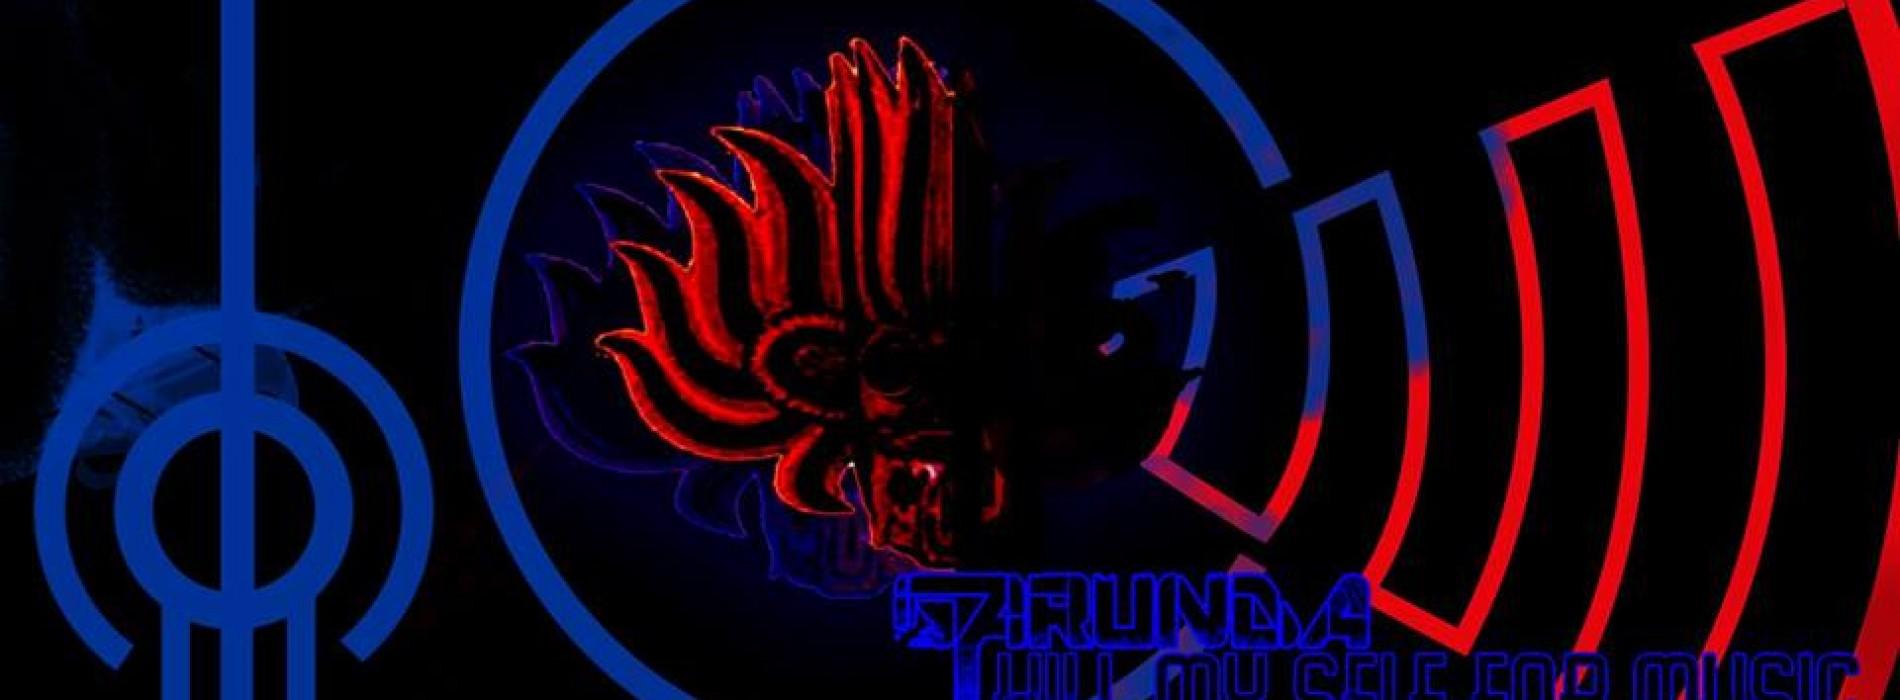 garunDa Has A New Track Comin Up